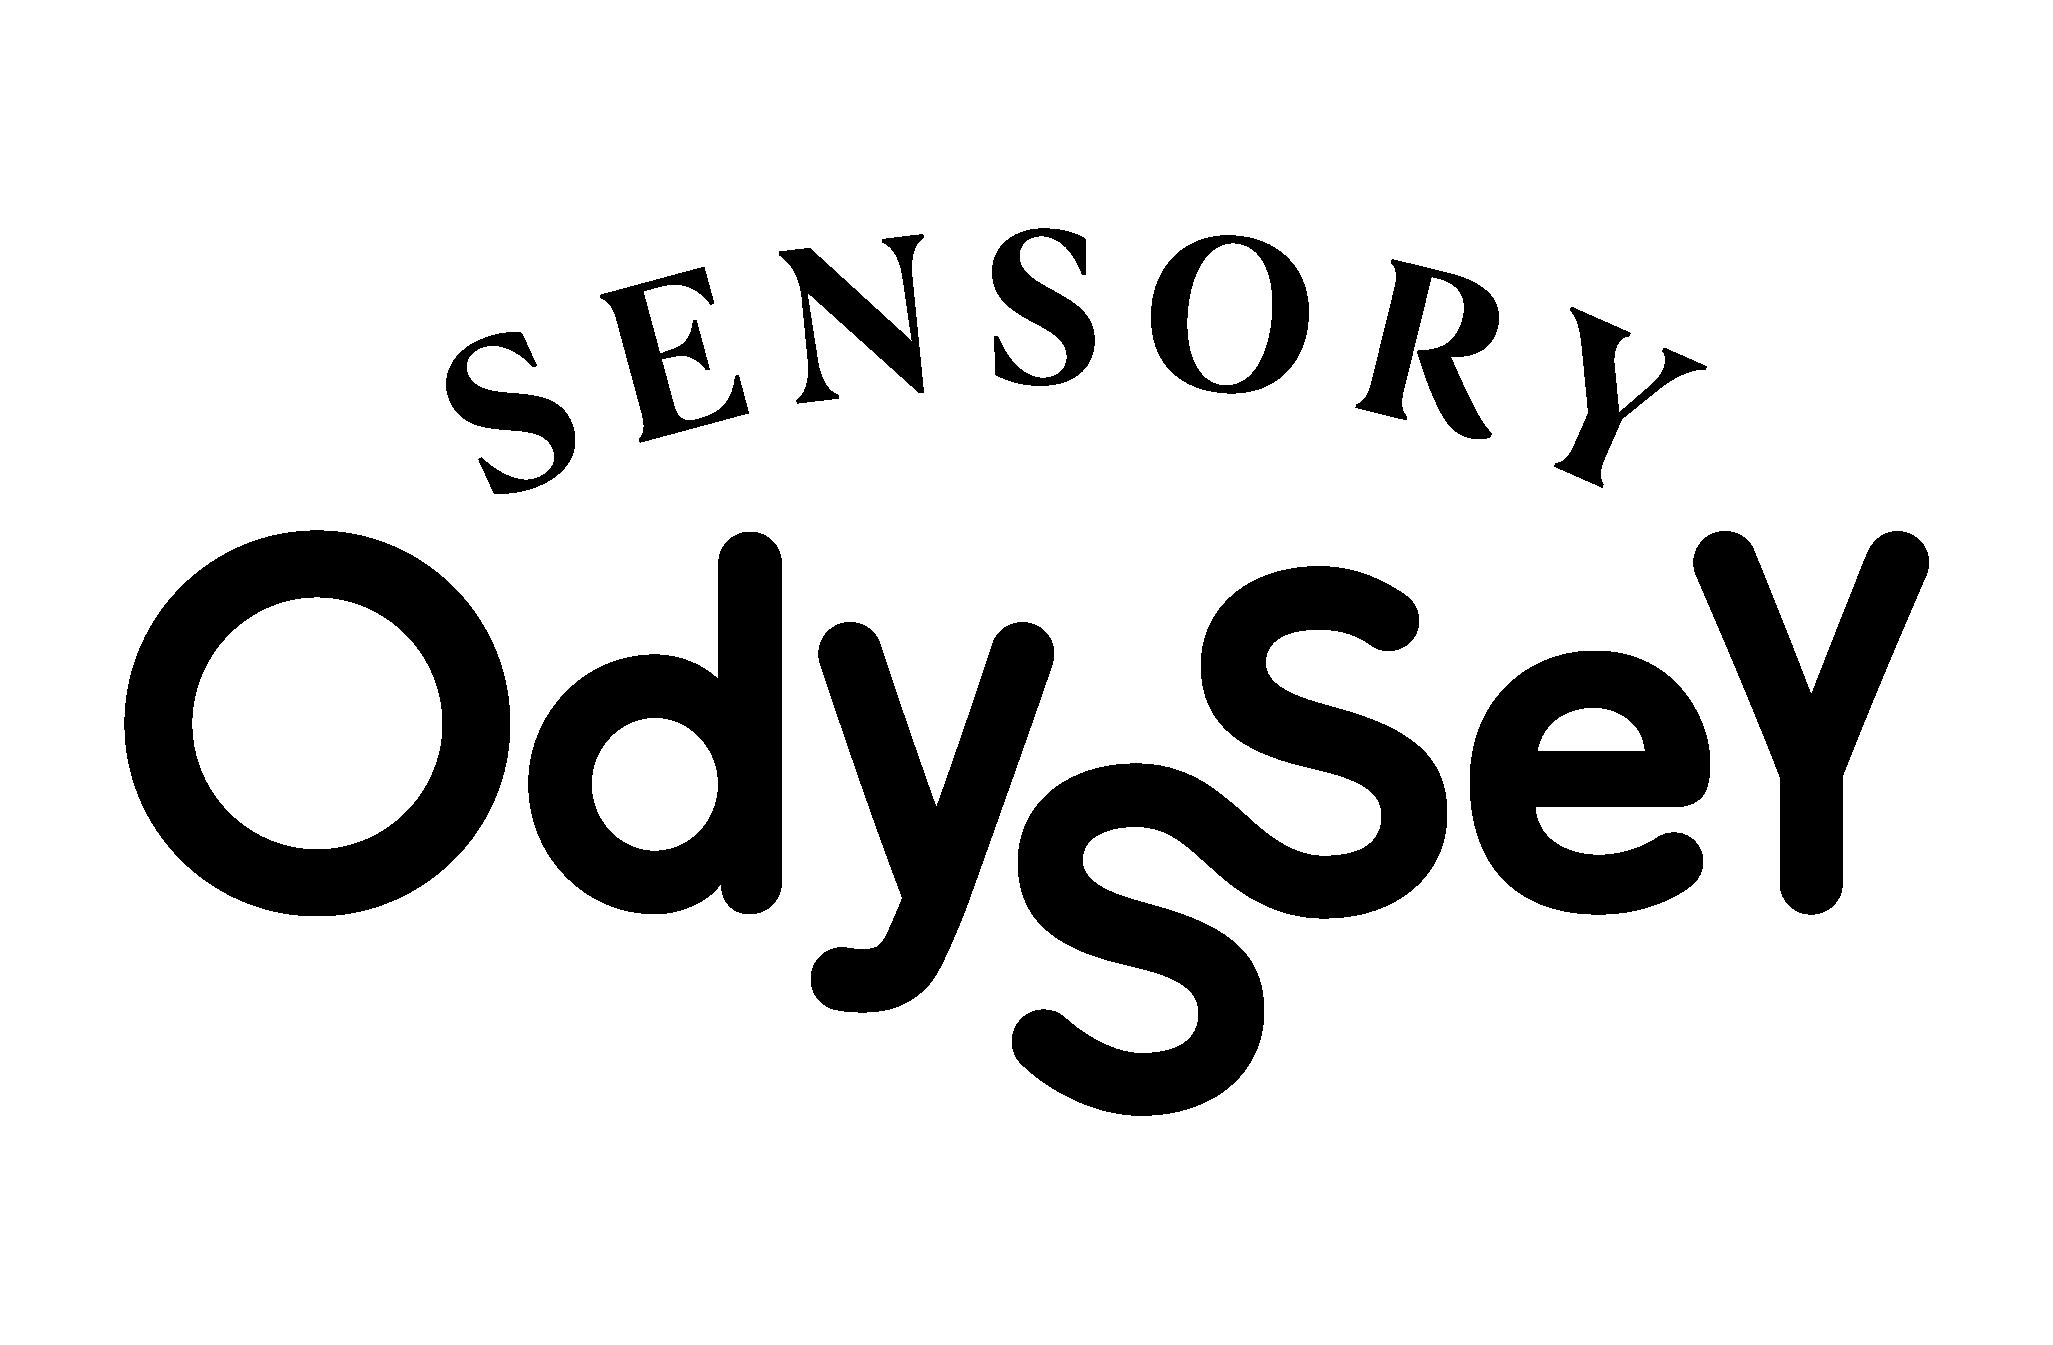 logo_Sensory_Odyssey-01